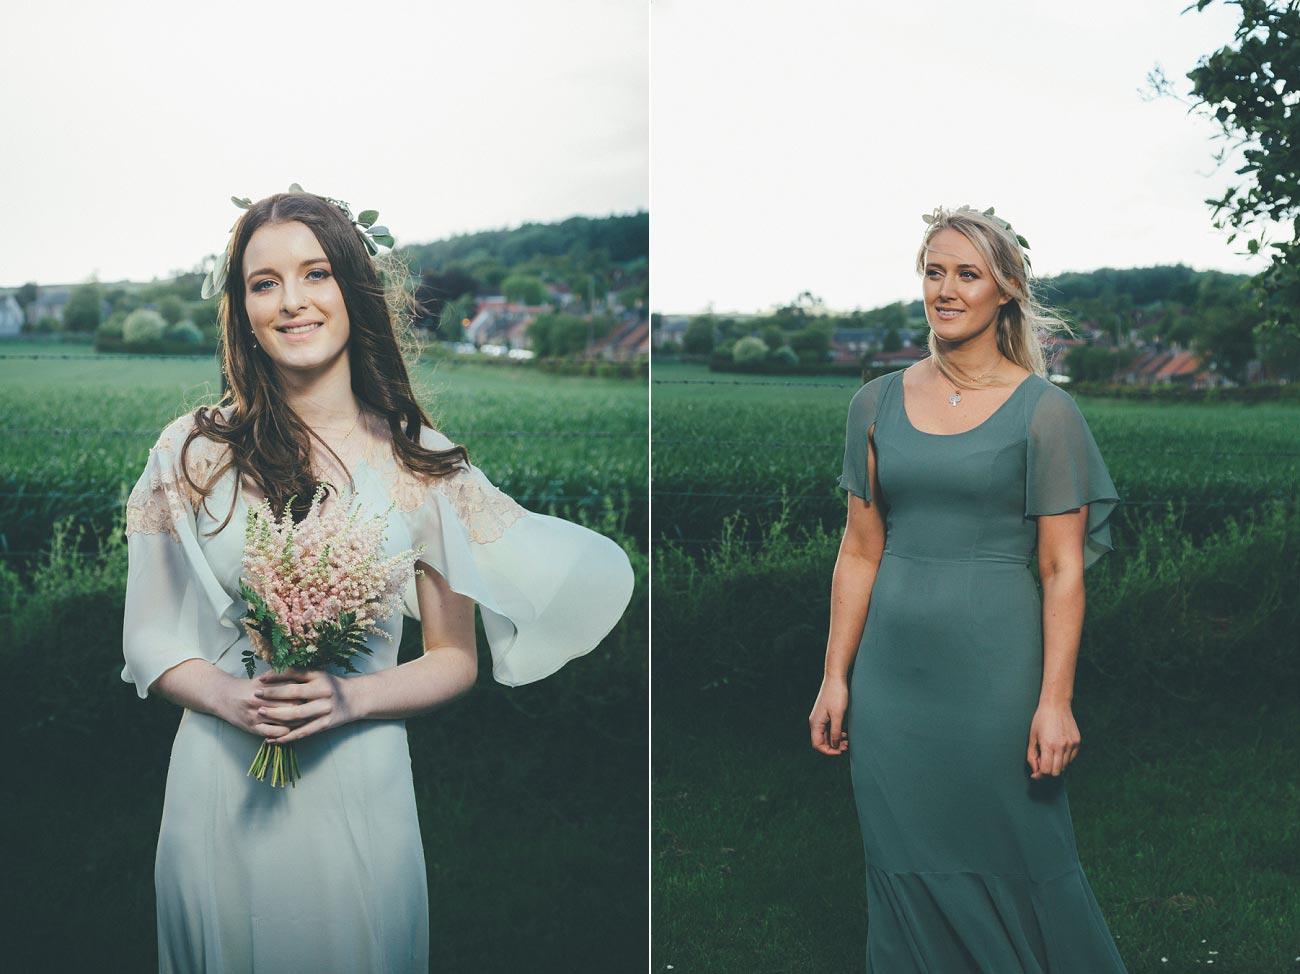 wedding photography fife letham village Hall scotland woodland vintage 0106